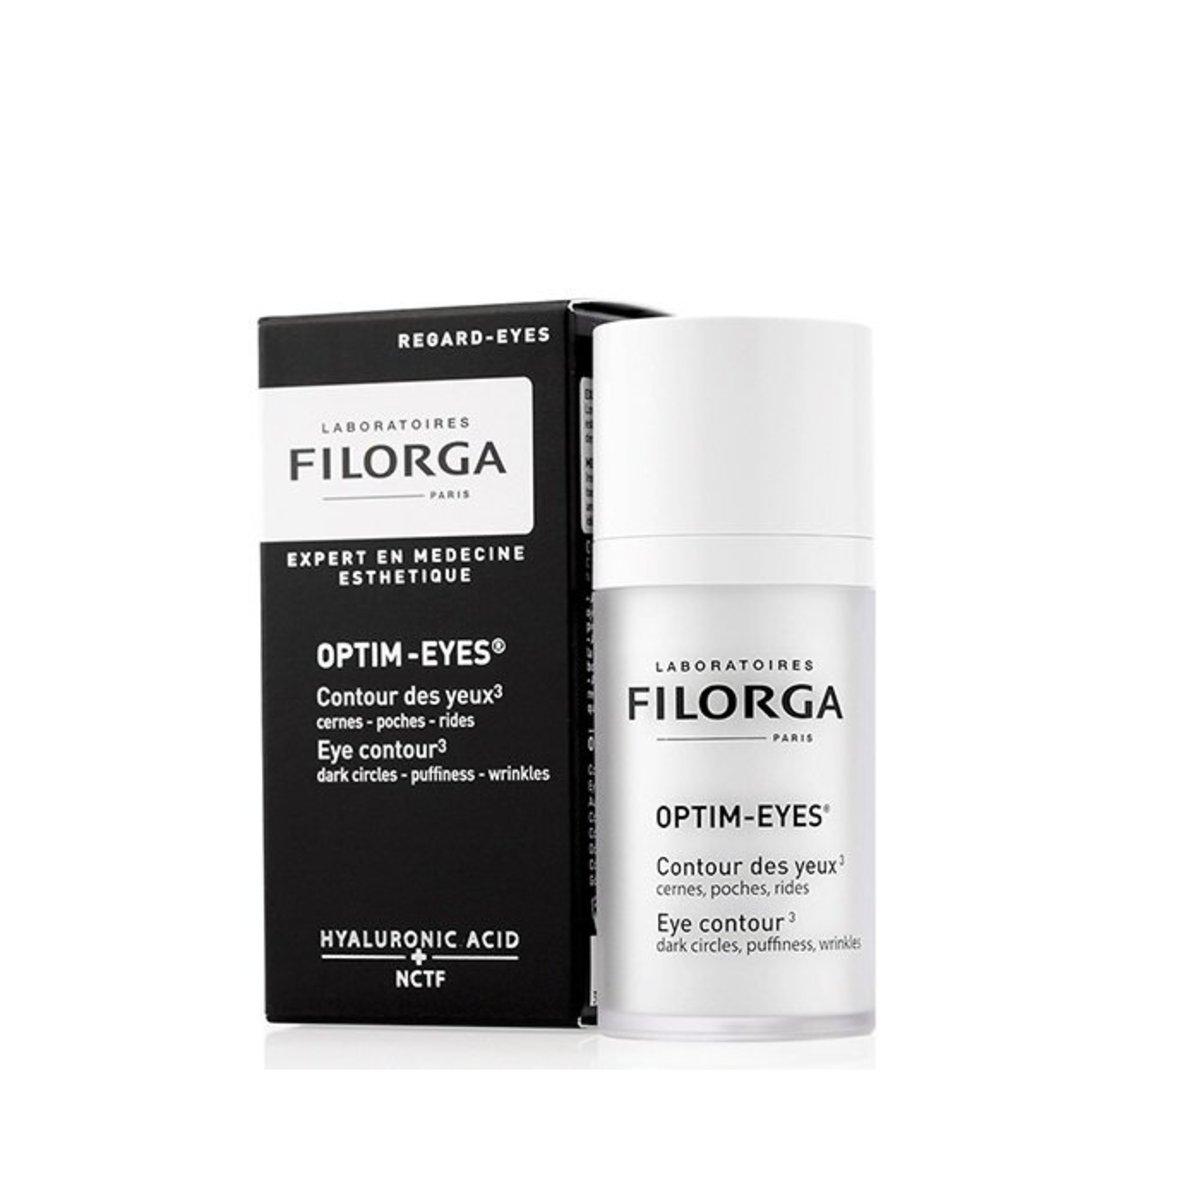 Filorga - Optim Eyes Contour 15ml ( 3401361057578)  [Parallel Import Product]